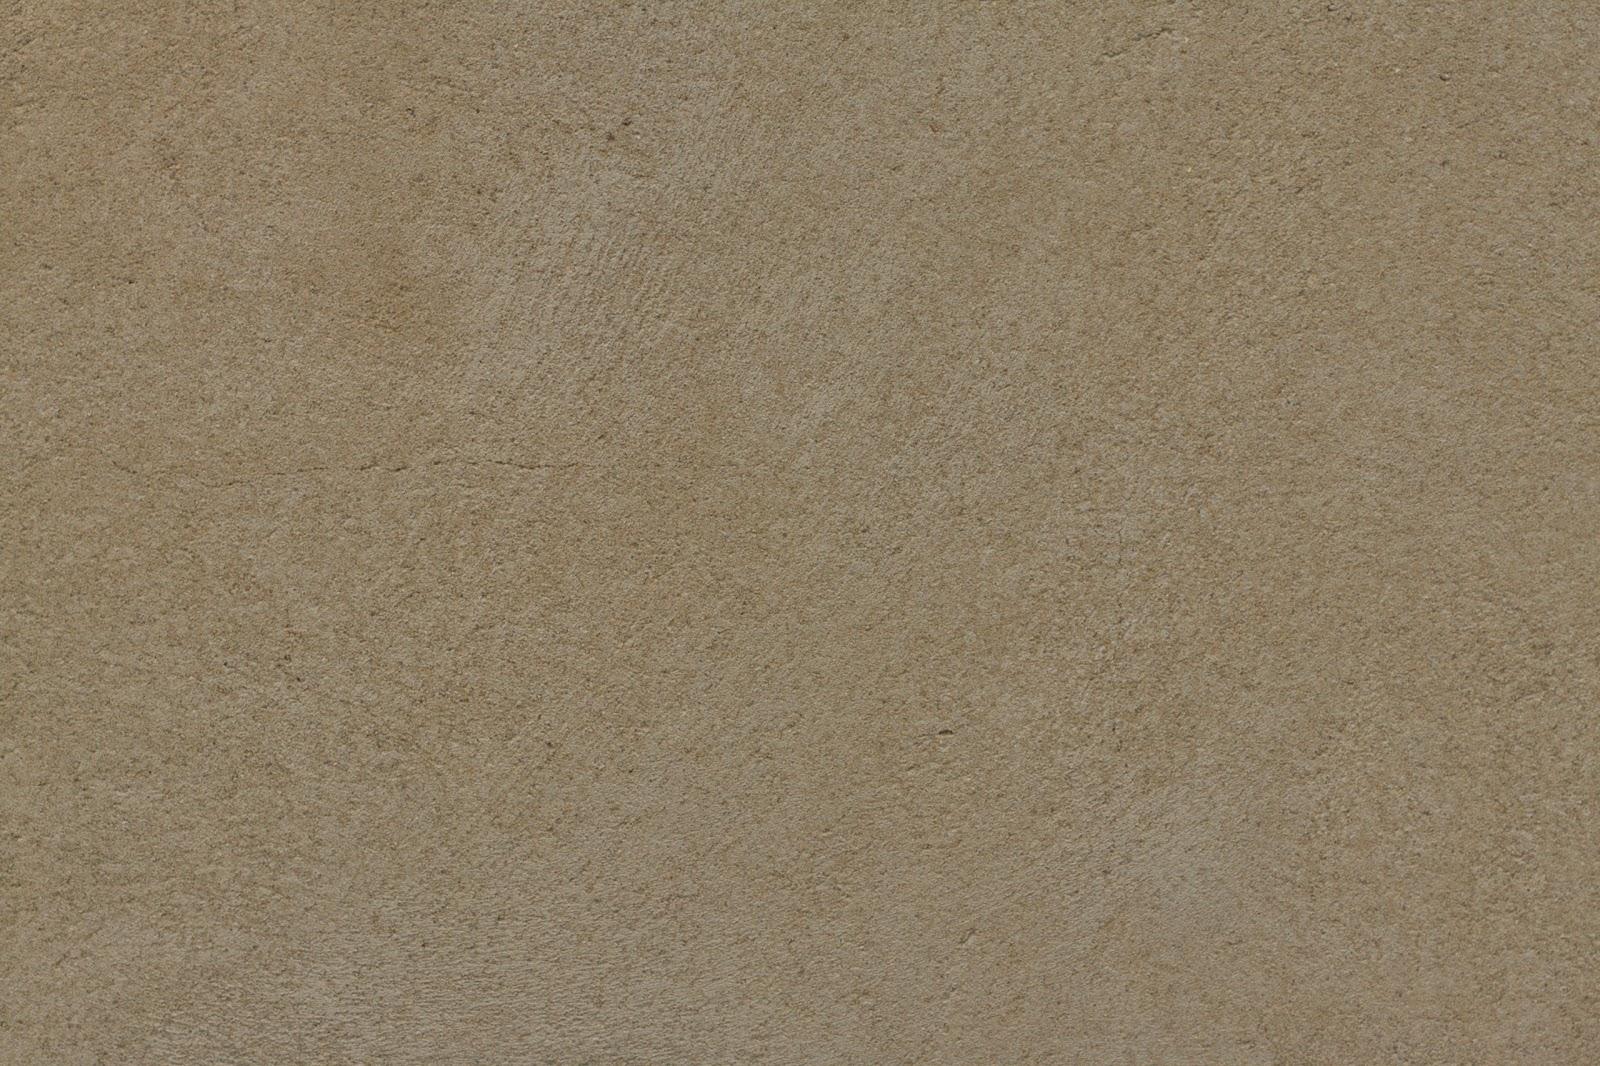 high resolution seamless textures stucco rough light brown wall texture 4770x3178